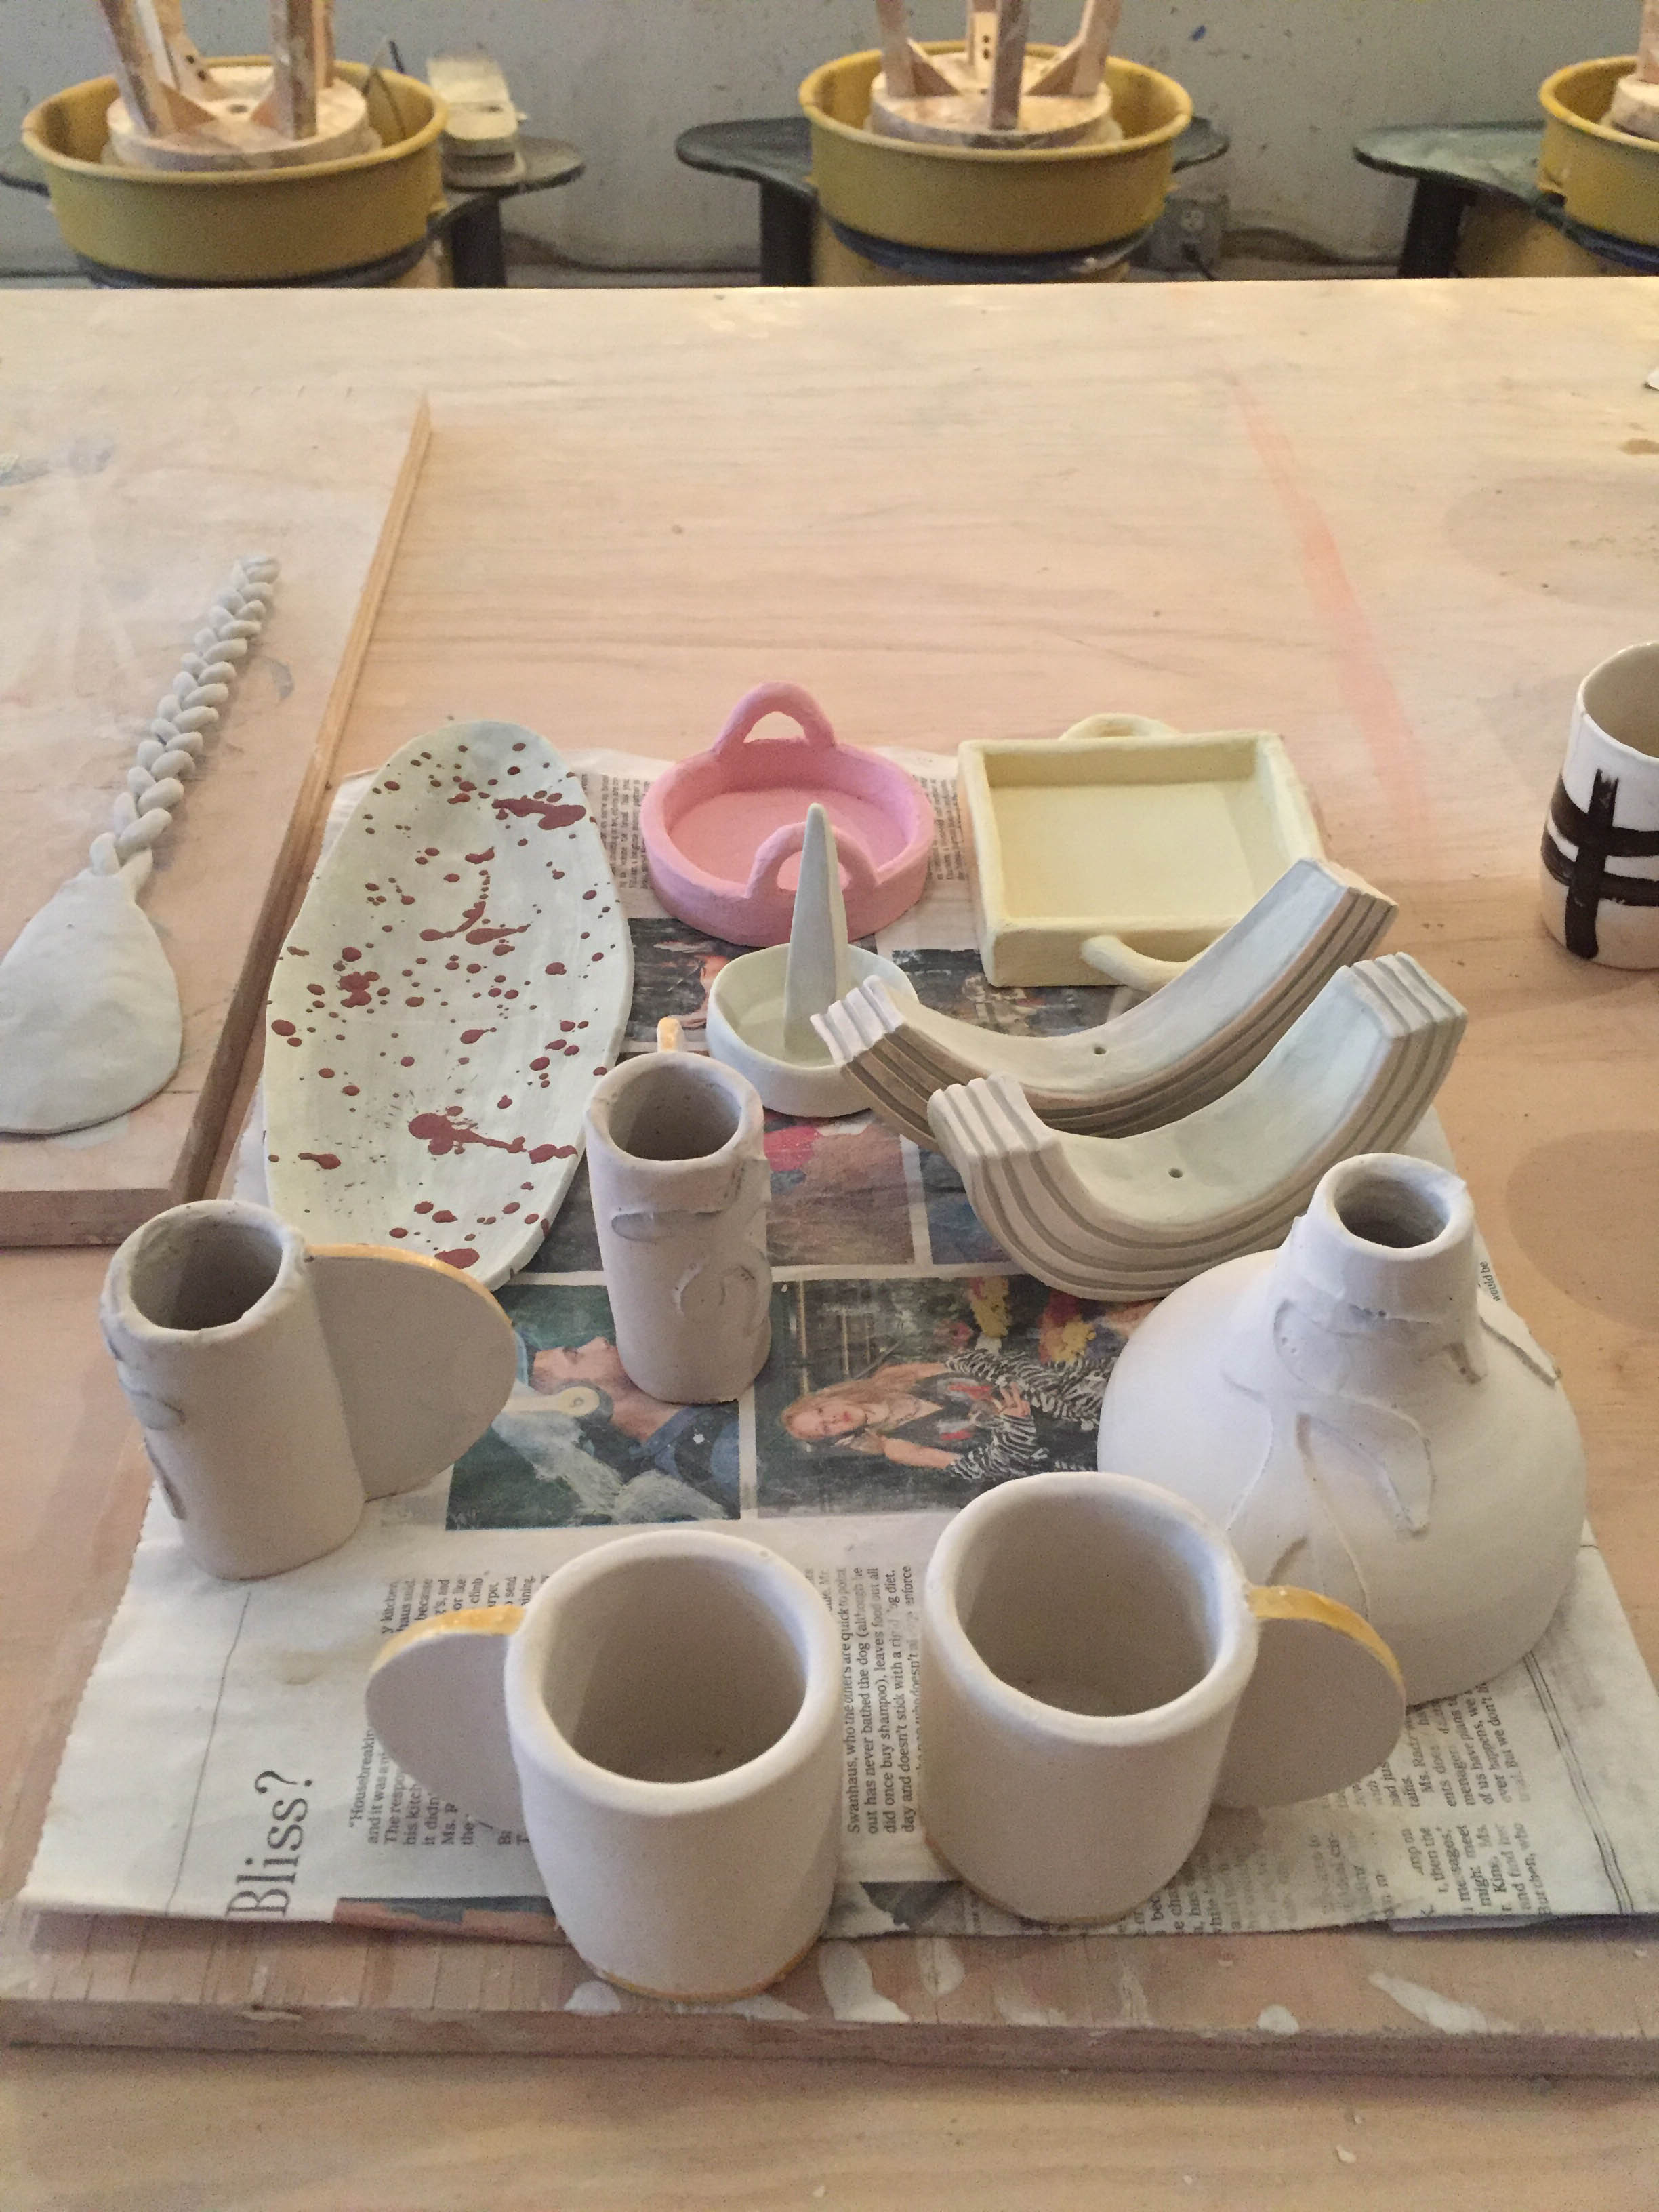 12.16_Ceramics_Artshack (23 of 25).jpg